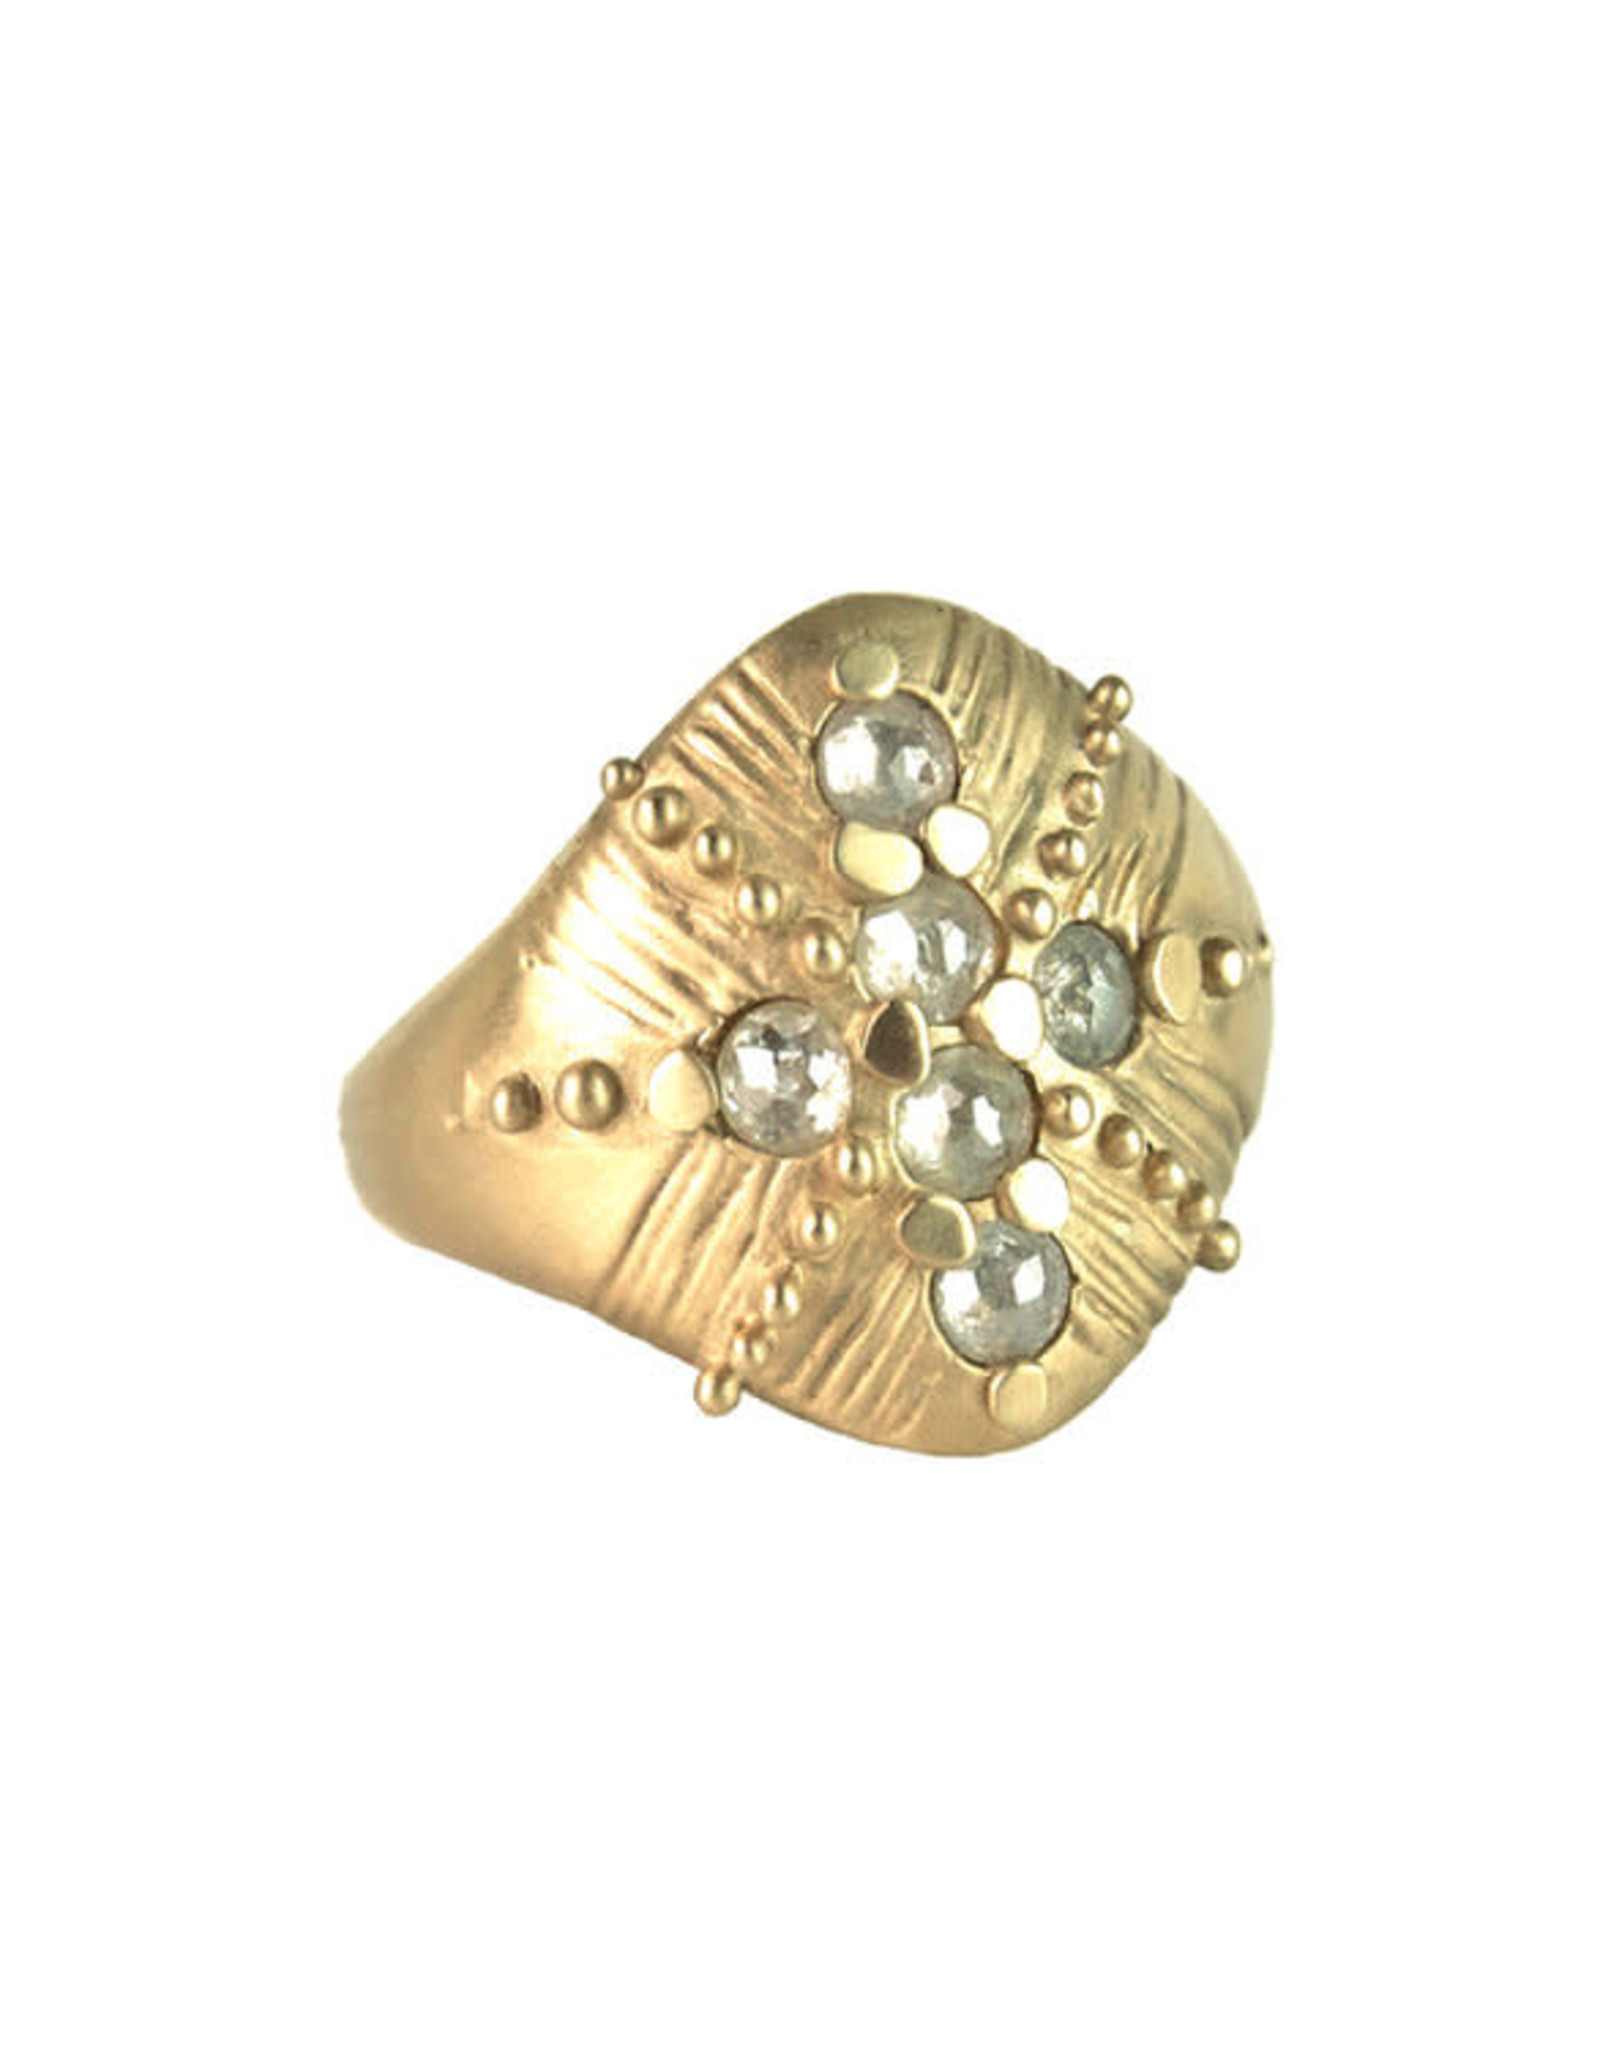 Lorak Jewelry Shield Ring - Sz. 7